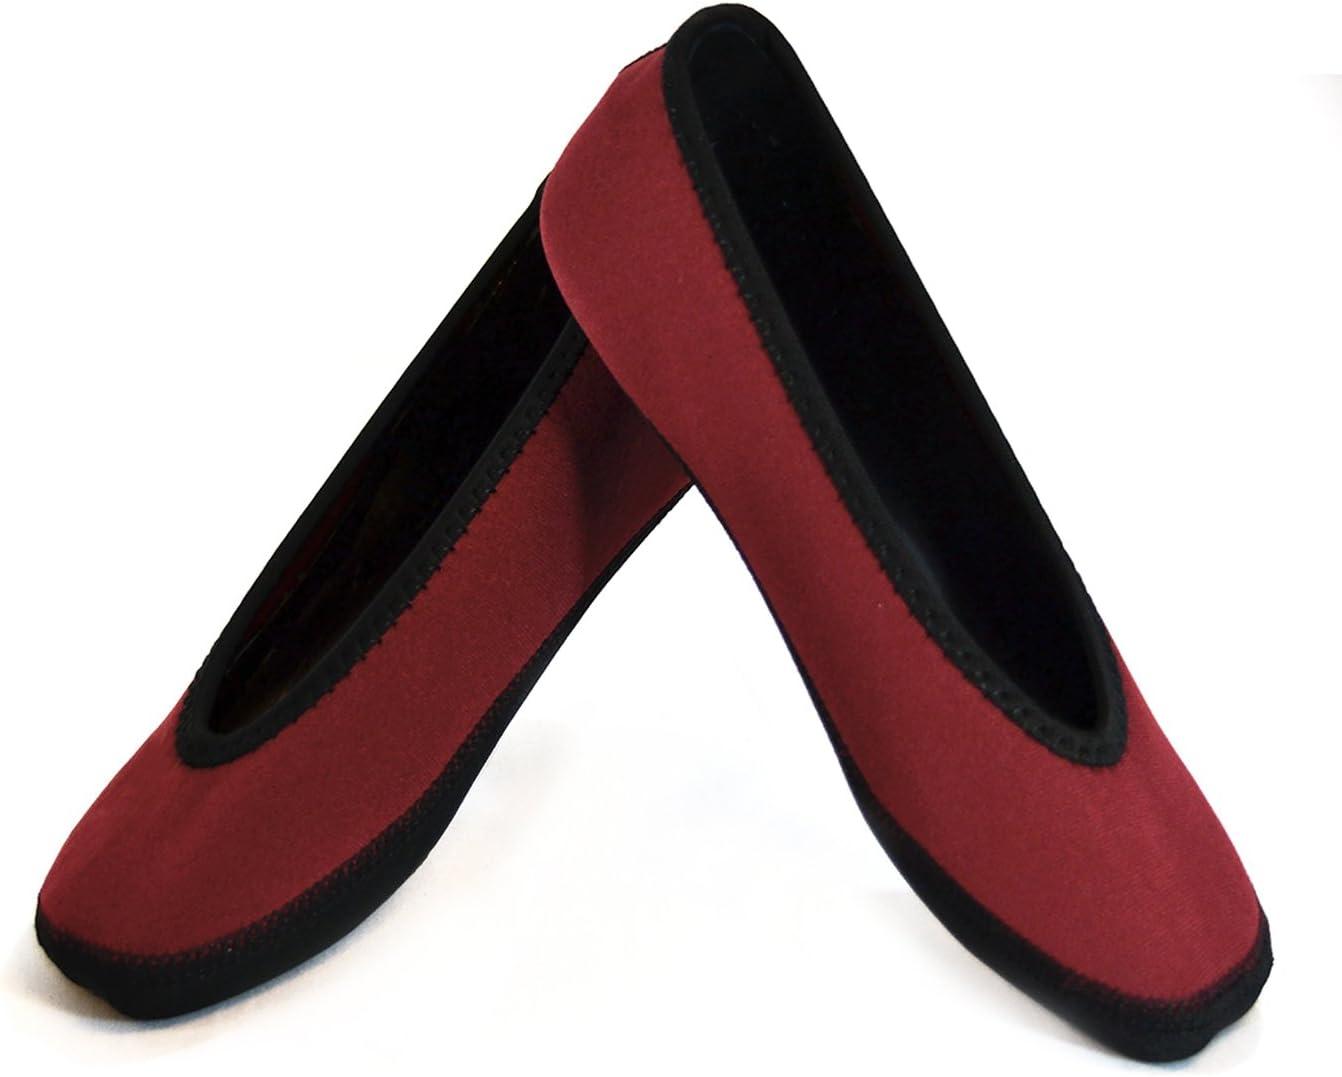 Nufoot Ballet Flats Women's Shoes, Foldable  Flexible Flats, Sl